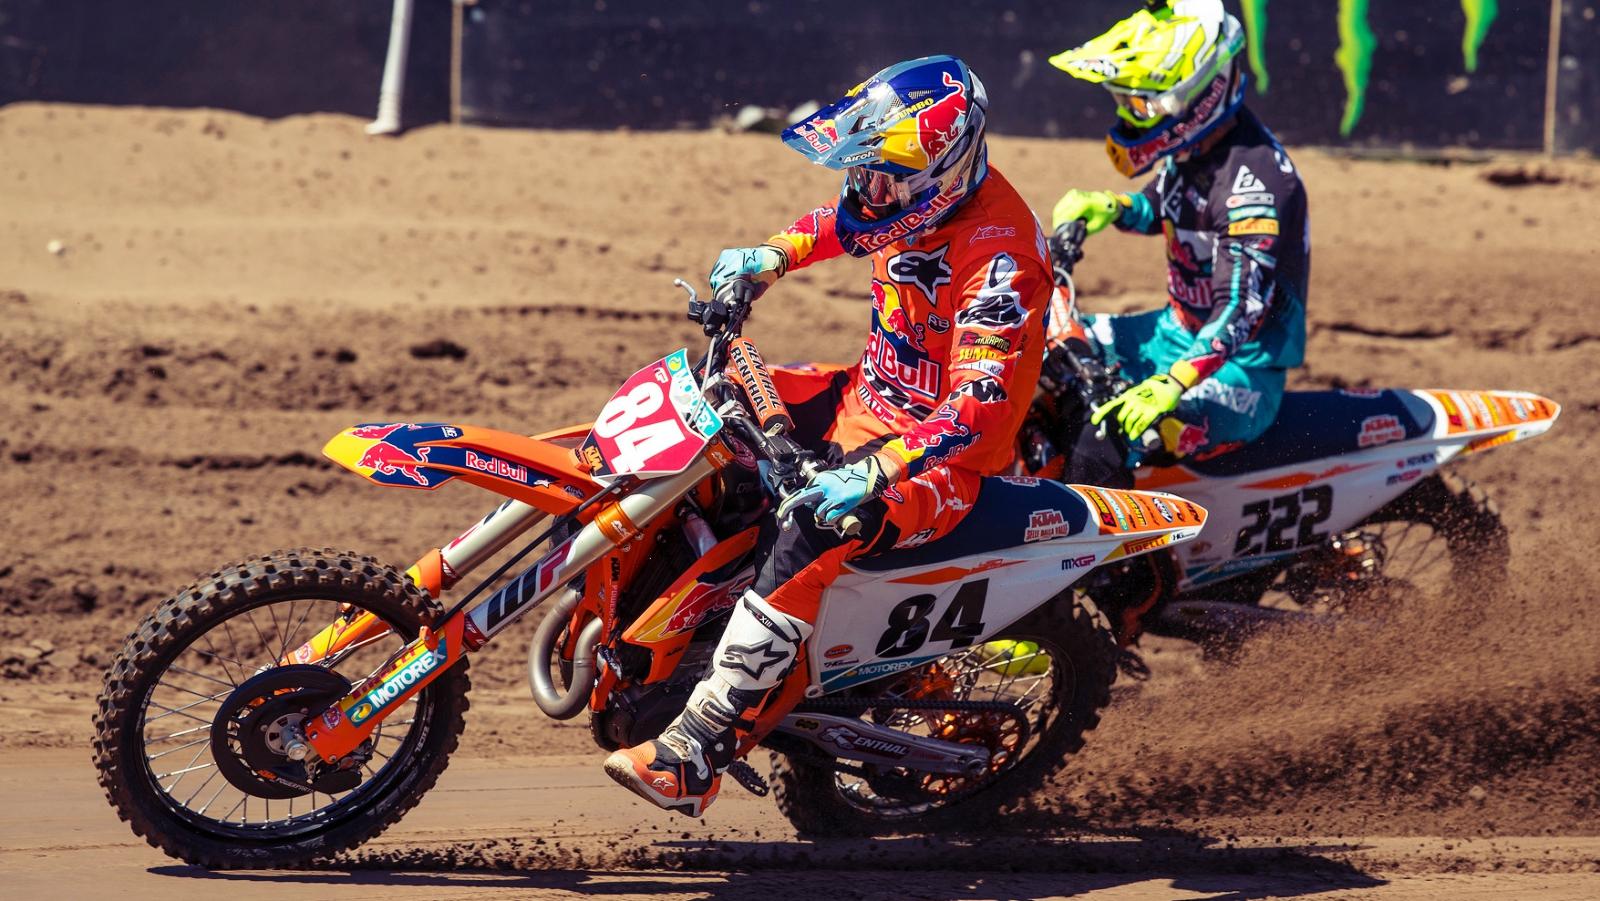 MXGP 2019: pilotos, motos, calendario, un español y cinco favoritos